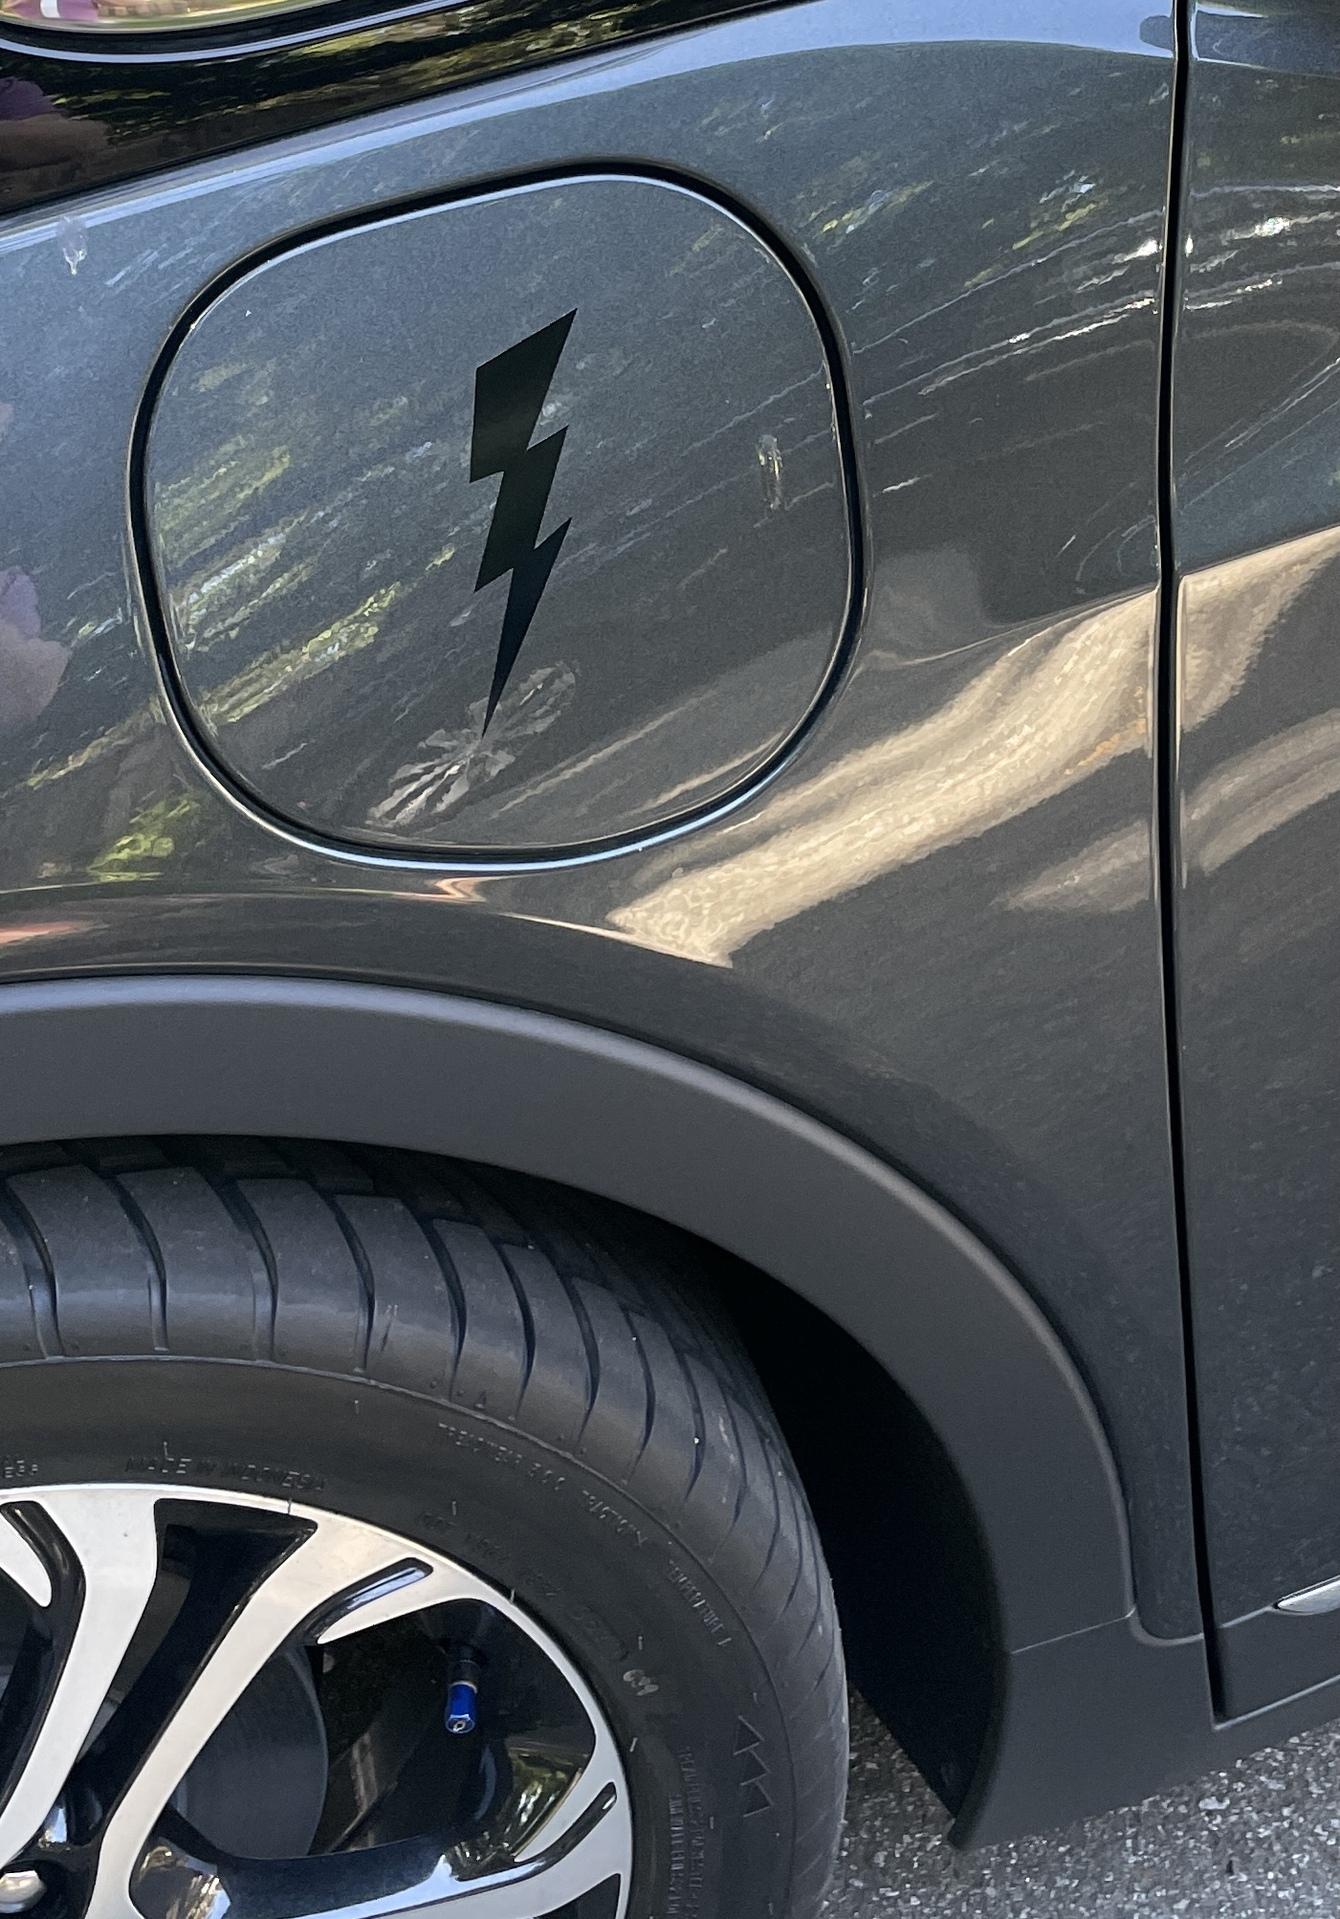 Khoi's photograph of their Classic Lightning Bolt Sticker